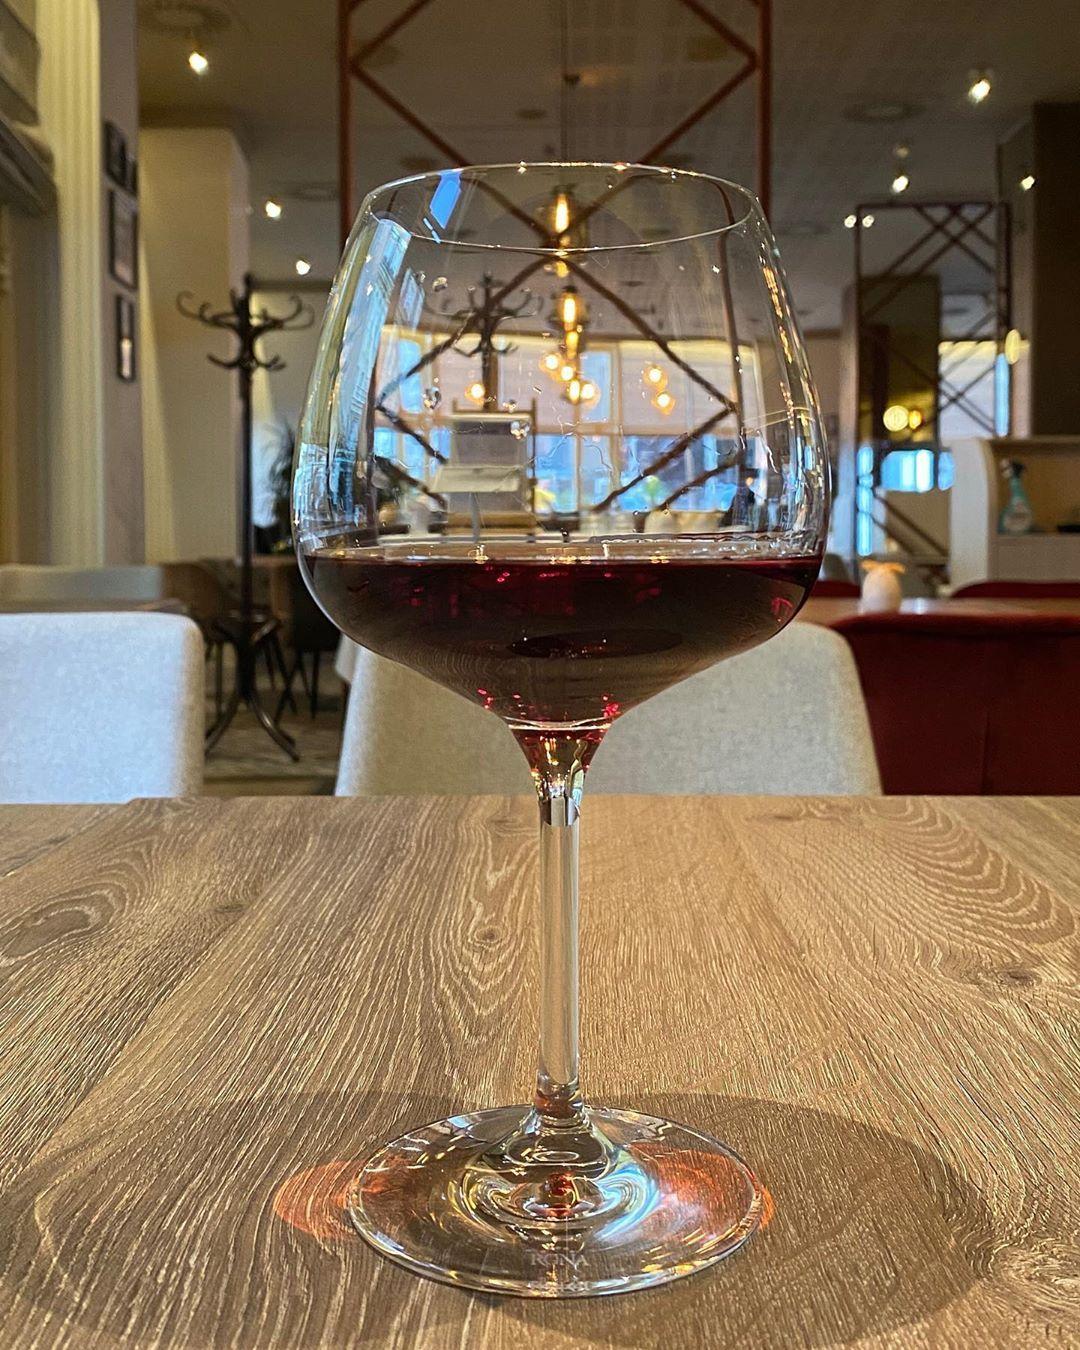 Alone but not lonely :) . . . #restaurant #dinner #dinnertime #restauraceostrava #vine #czechcuisine #imperialhotelostrava @imperialostrava